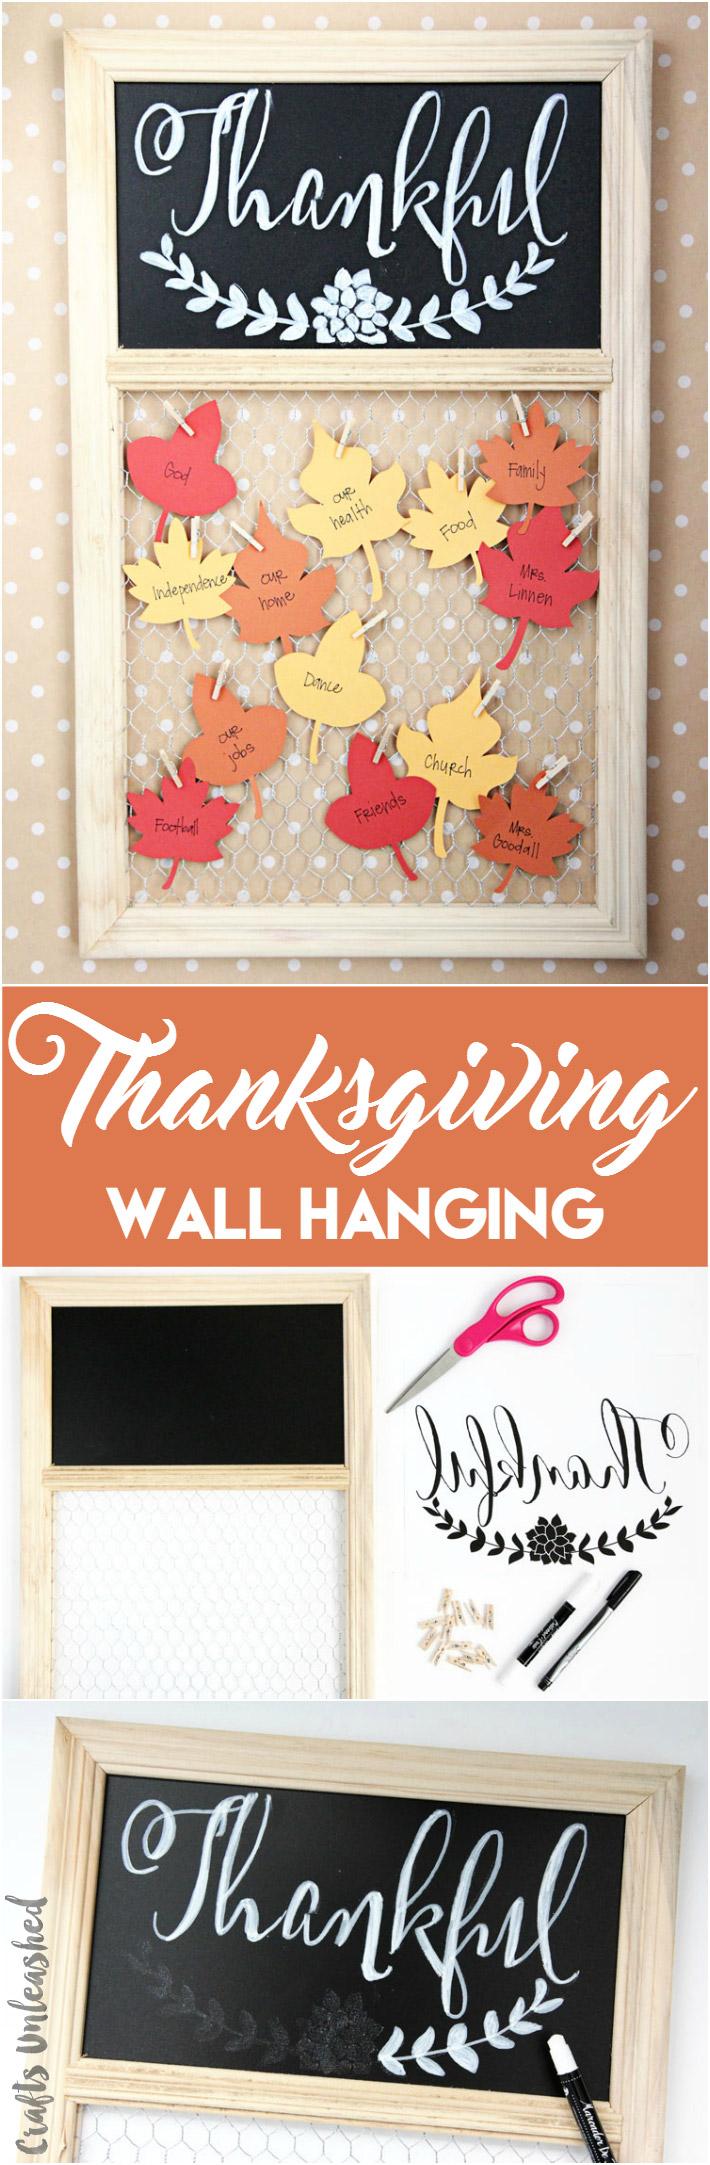 DIY Thanksgiving Project Thankful Wall Display Consumer